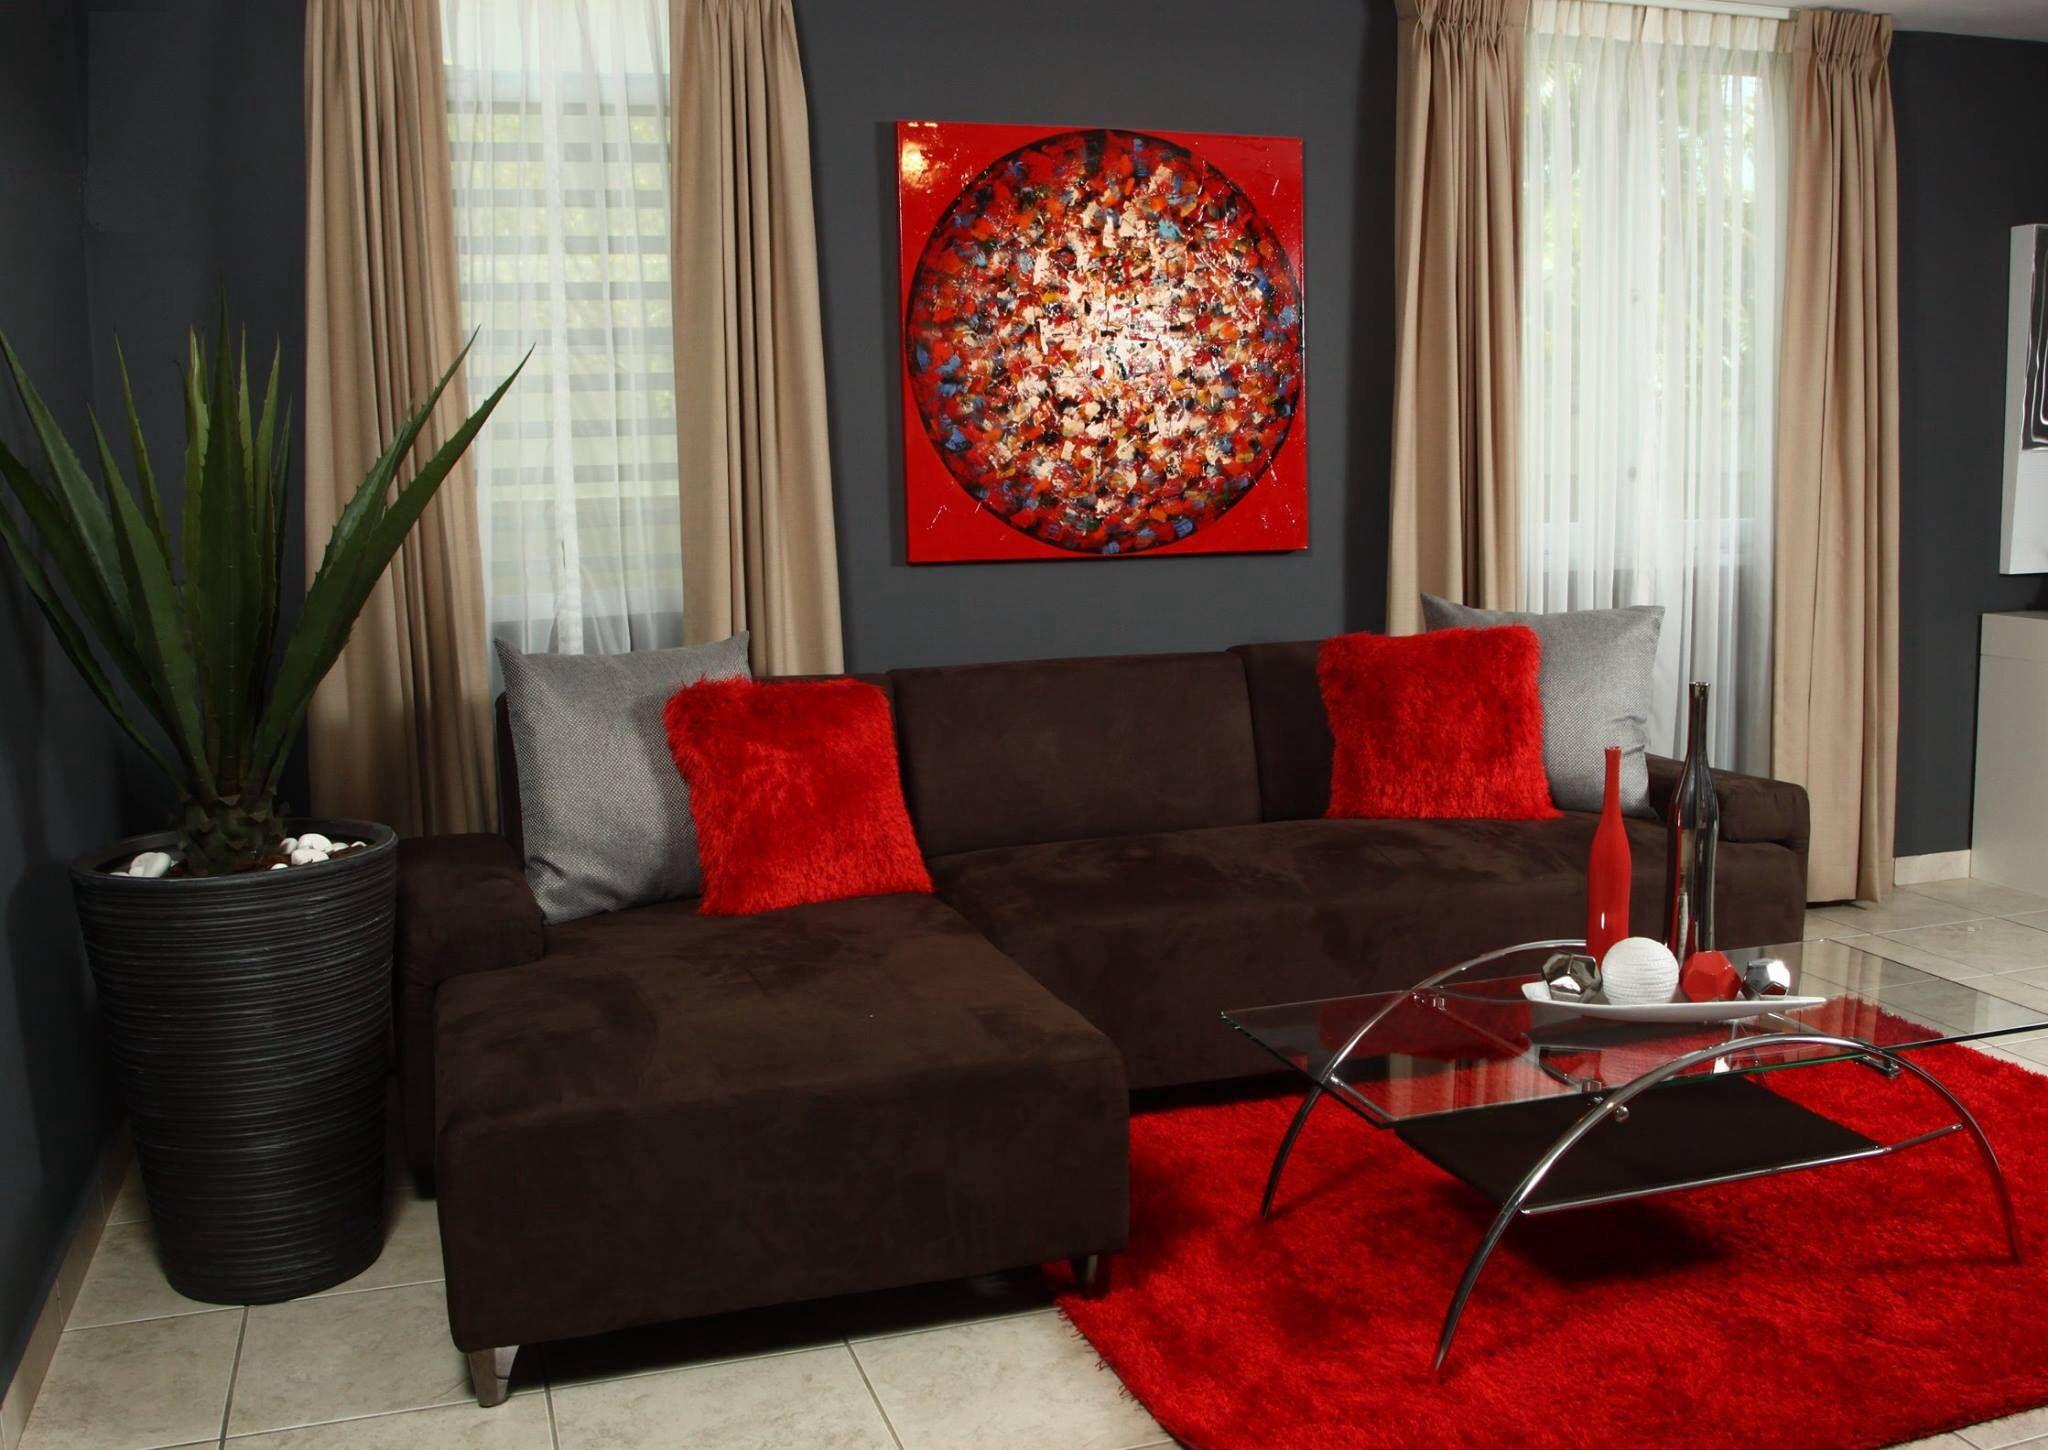 Pin by Kennisha Frett on home decor in 2019  Living room